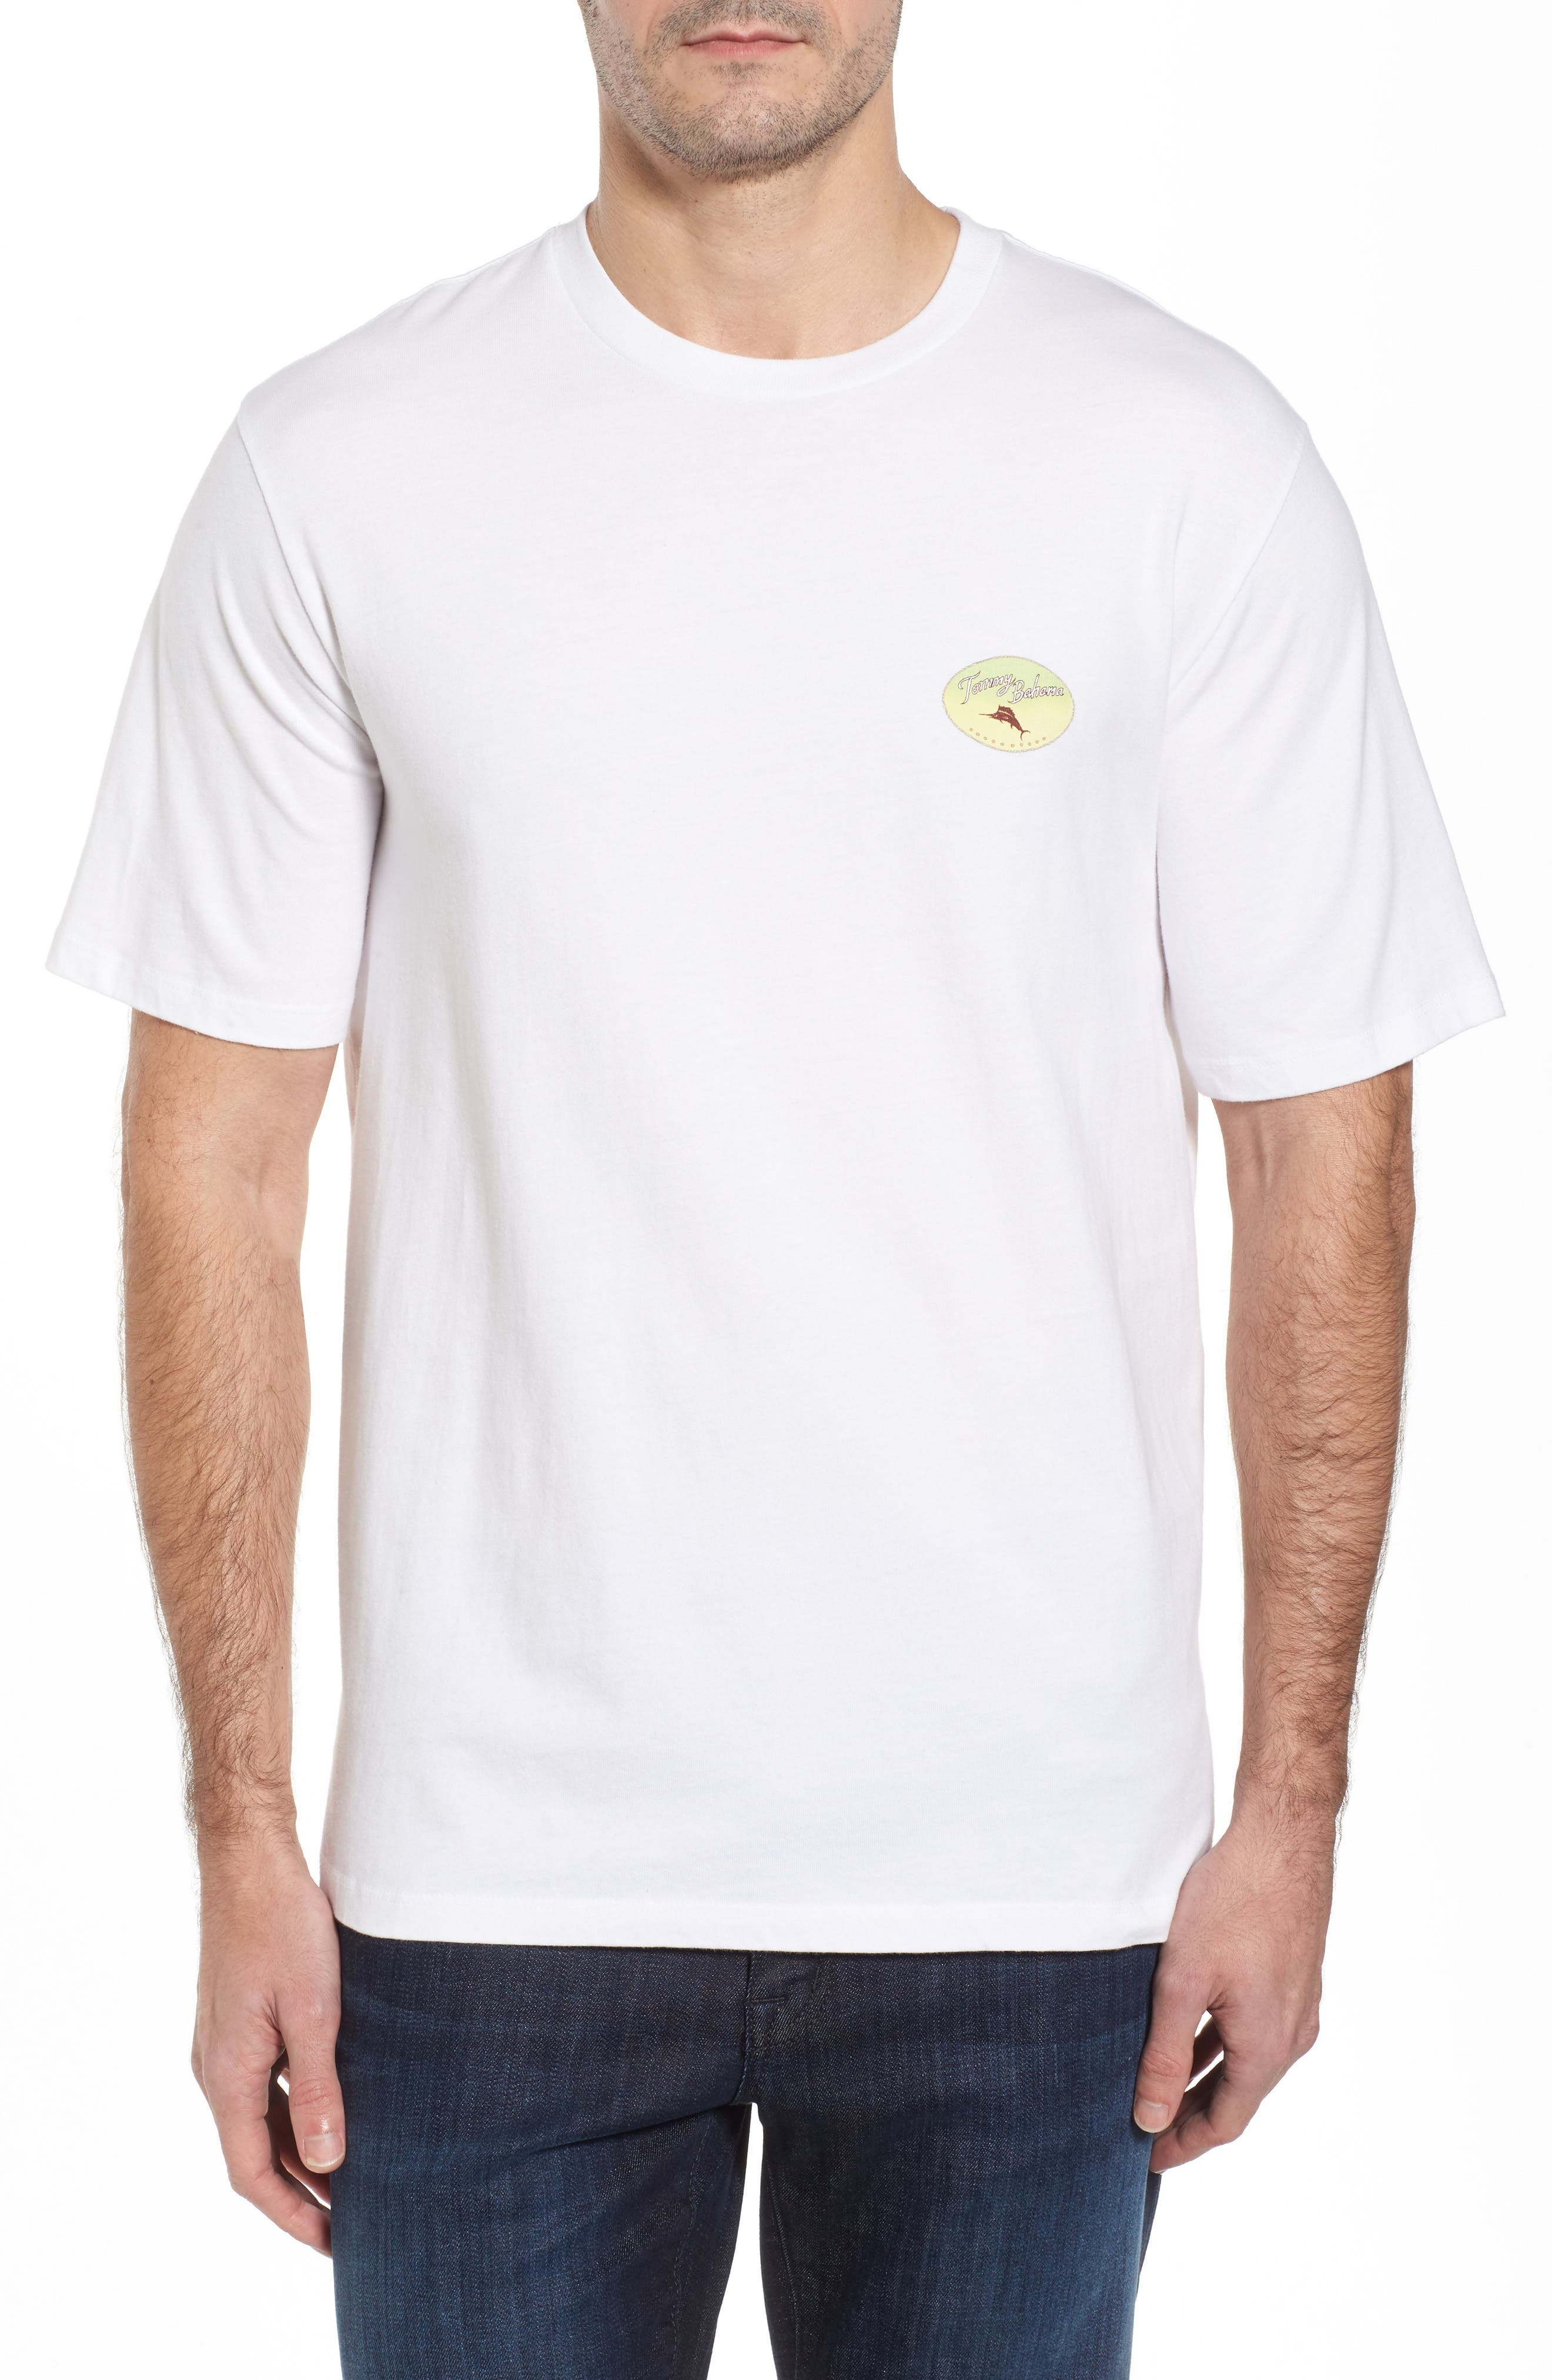 Improve Your Swing T-Shirt,                             Main thumbnail 1, color,                             100